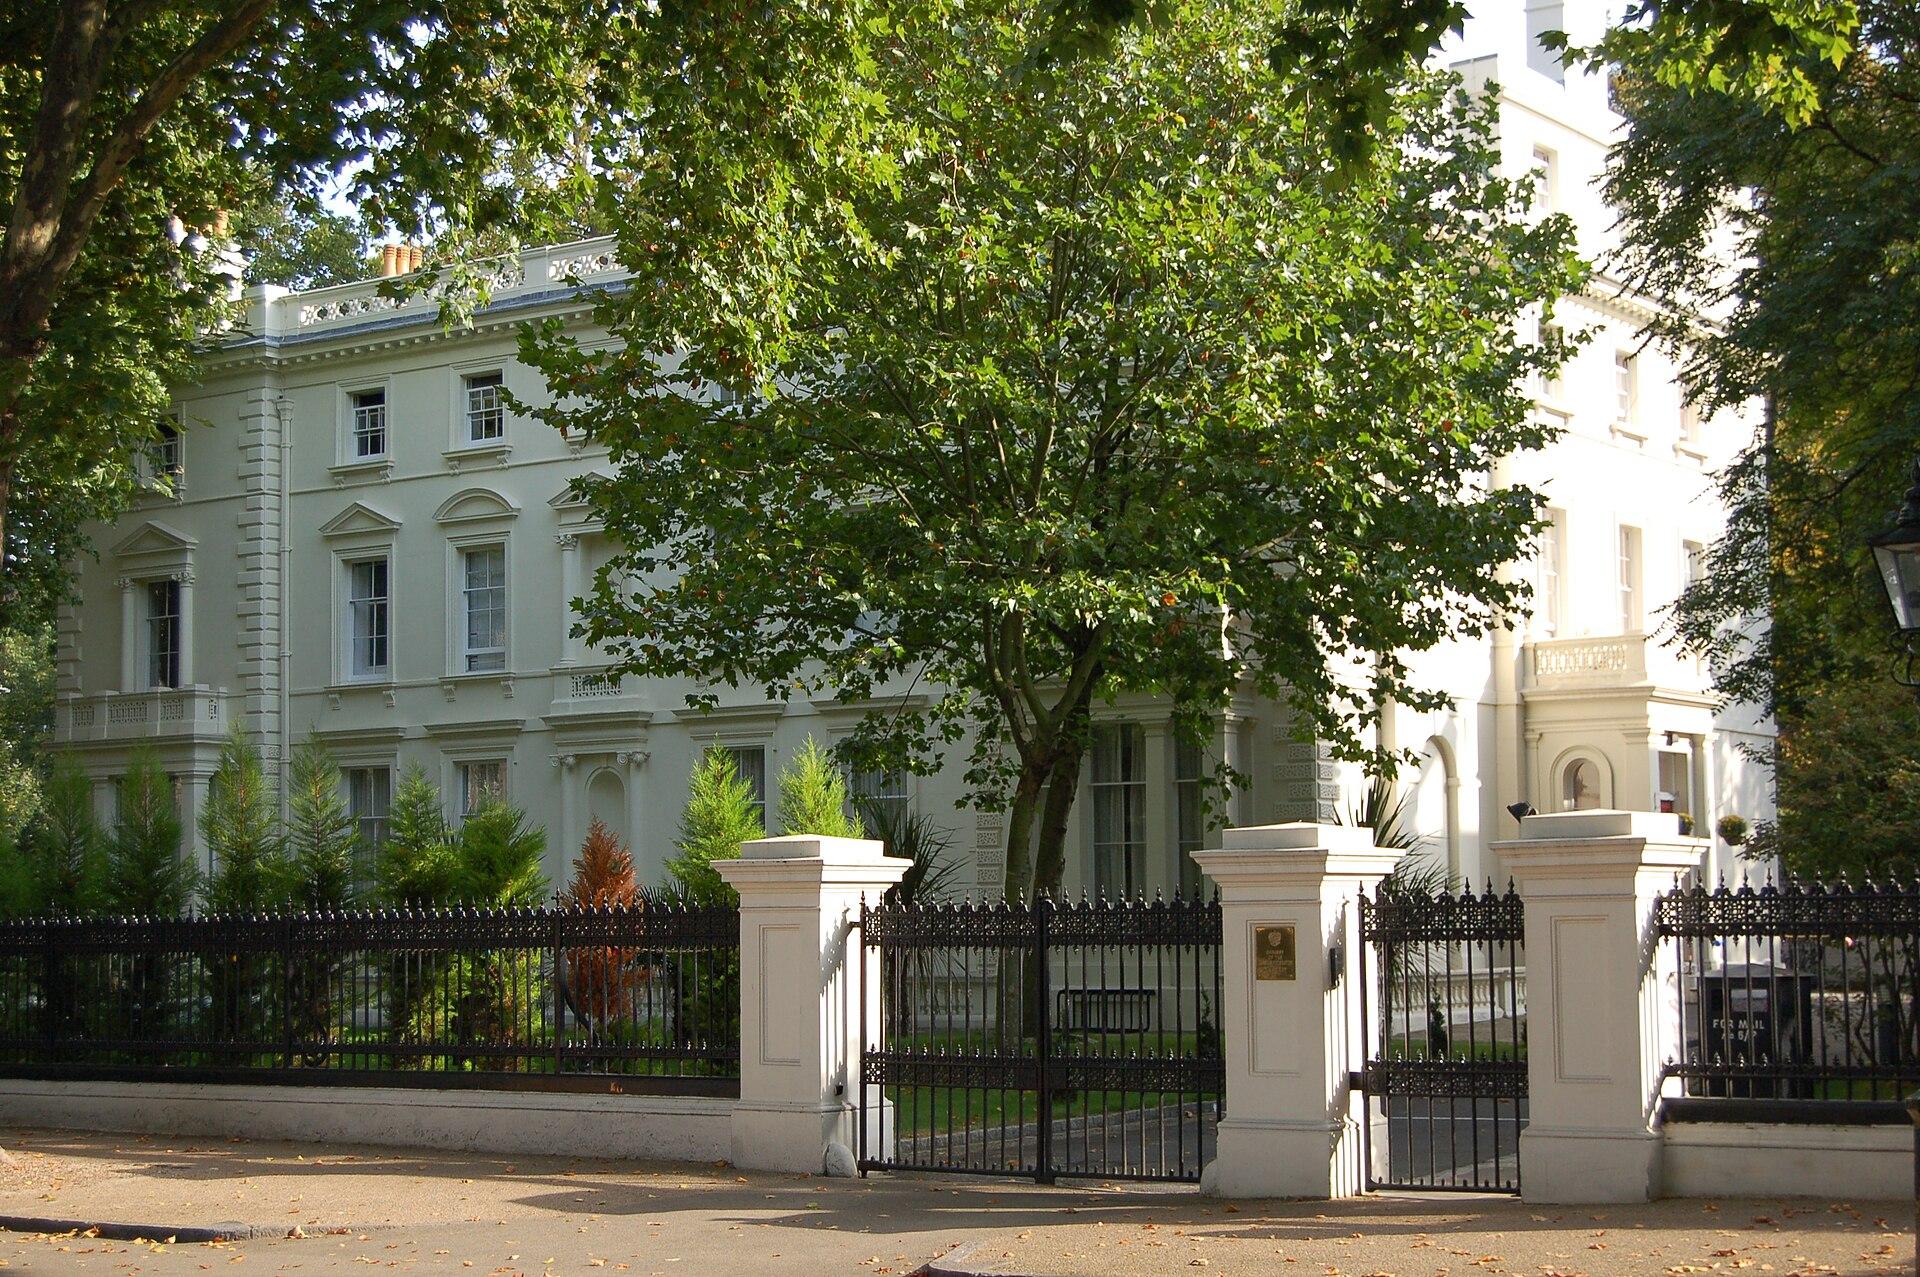 Kensington palace gardens wikipedia for The kensington house